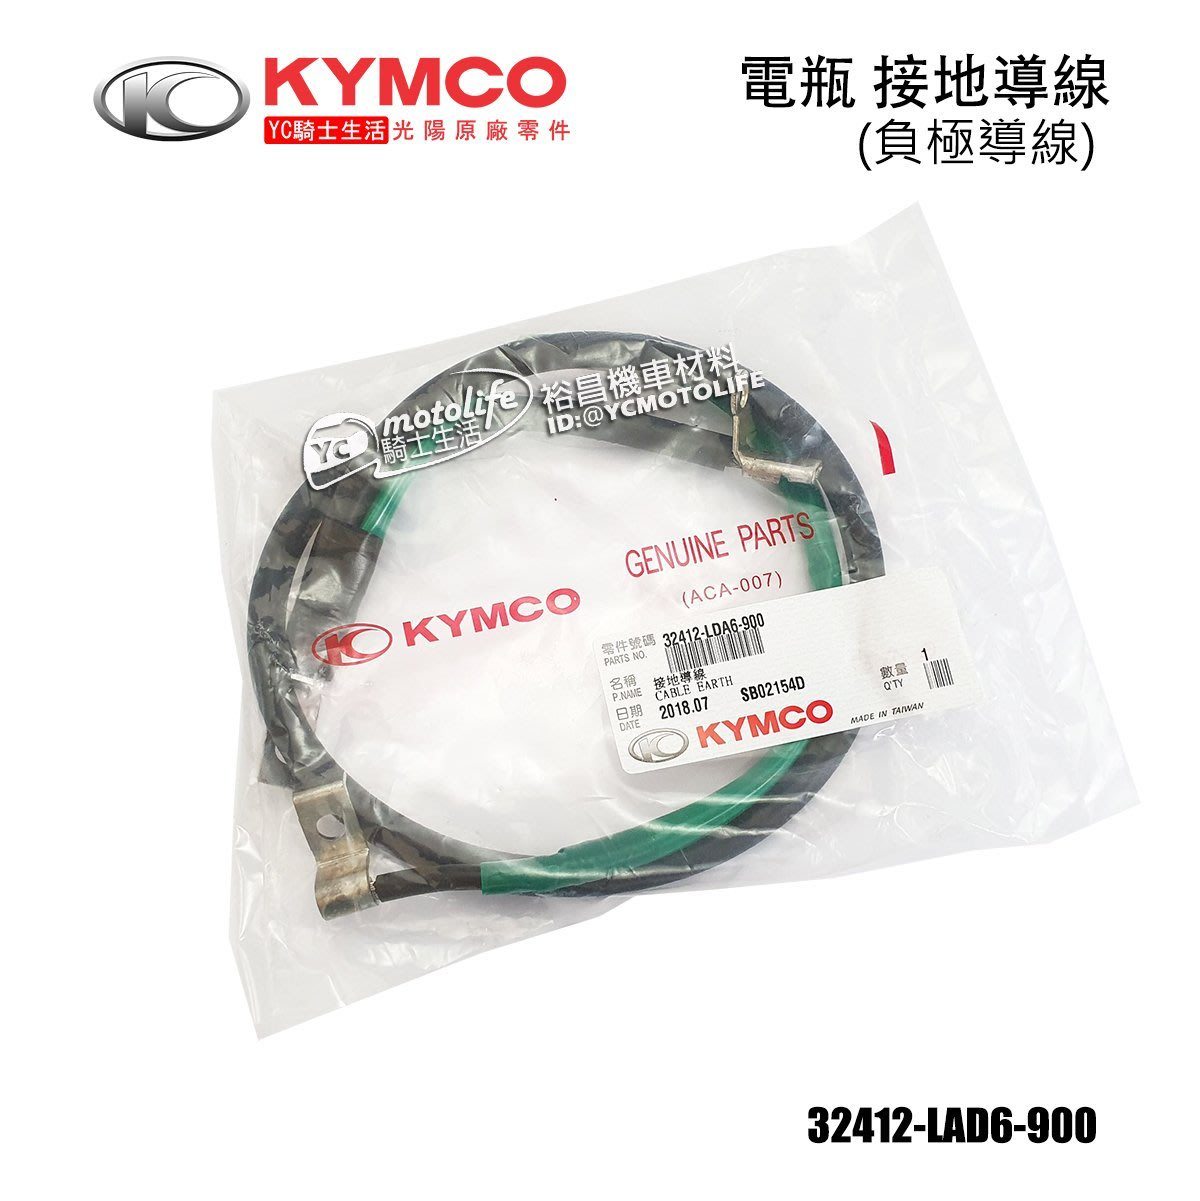 YC騎士生活_KYMCO光陽原廠 電瓶導線 接地線 GP、VP 125 電瓶接地導線 32412-LAD6-900